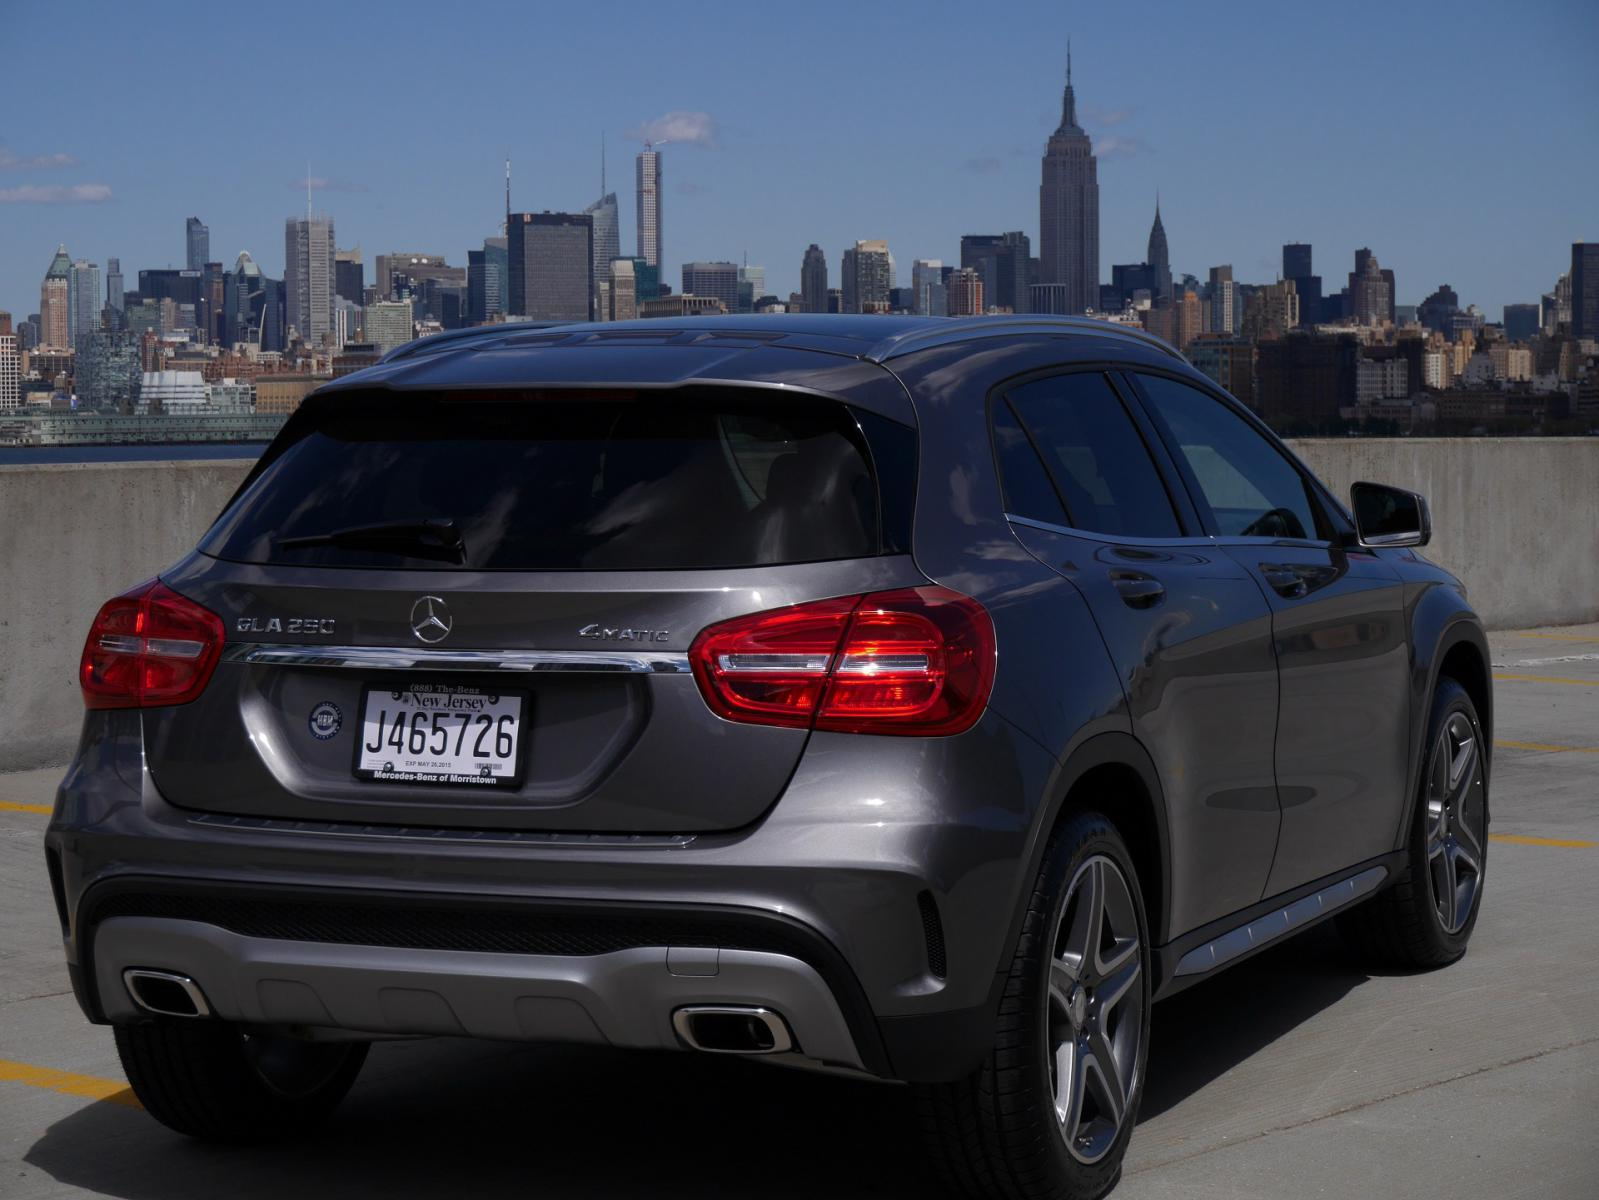 Mercedes Benz Of Morristown >> Mountain Grey Metallic picture thread - Mercedes GLA Forum